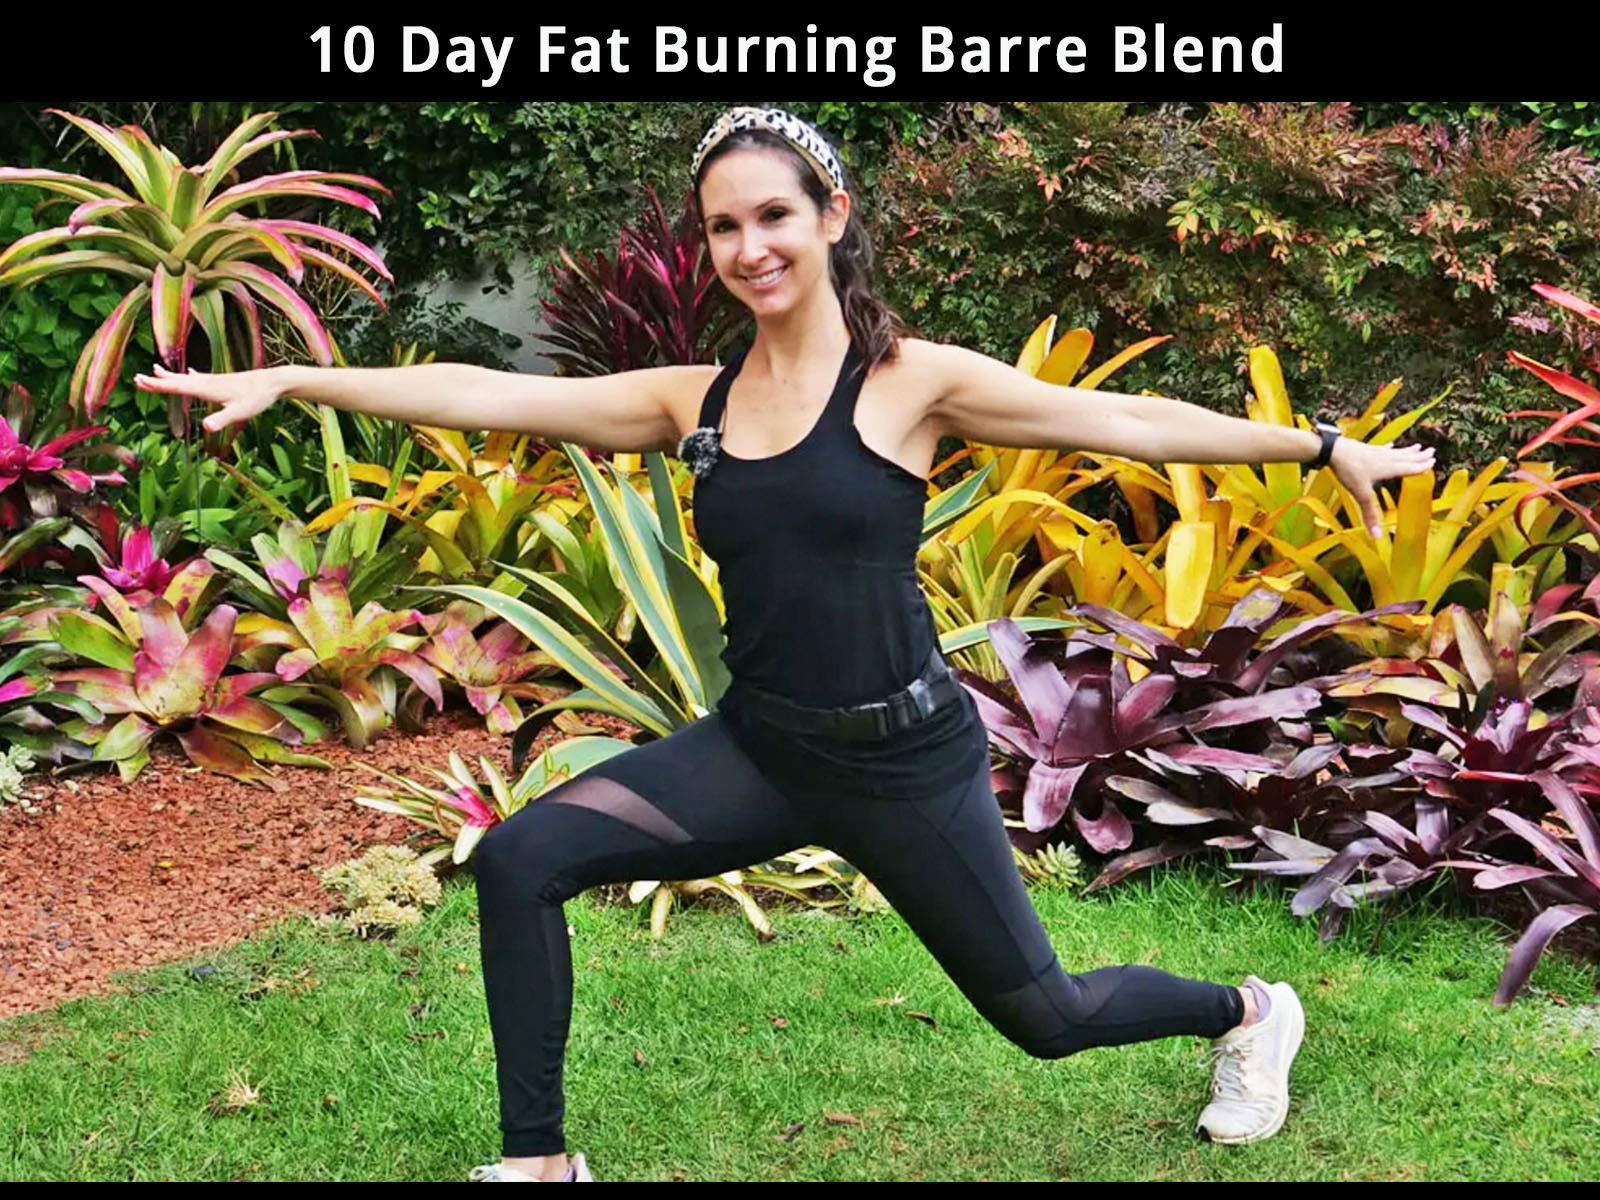 10 Day Fat Burning Barre Blend - Season 1